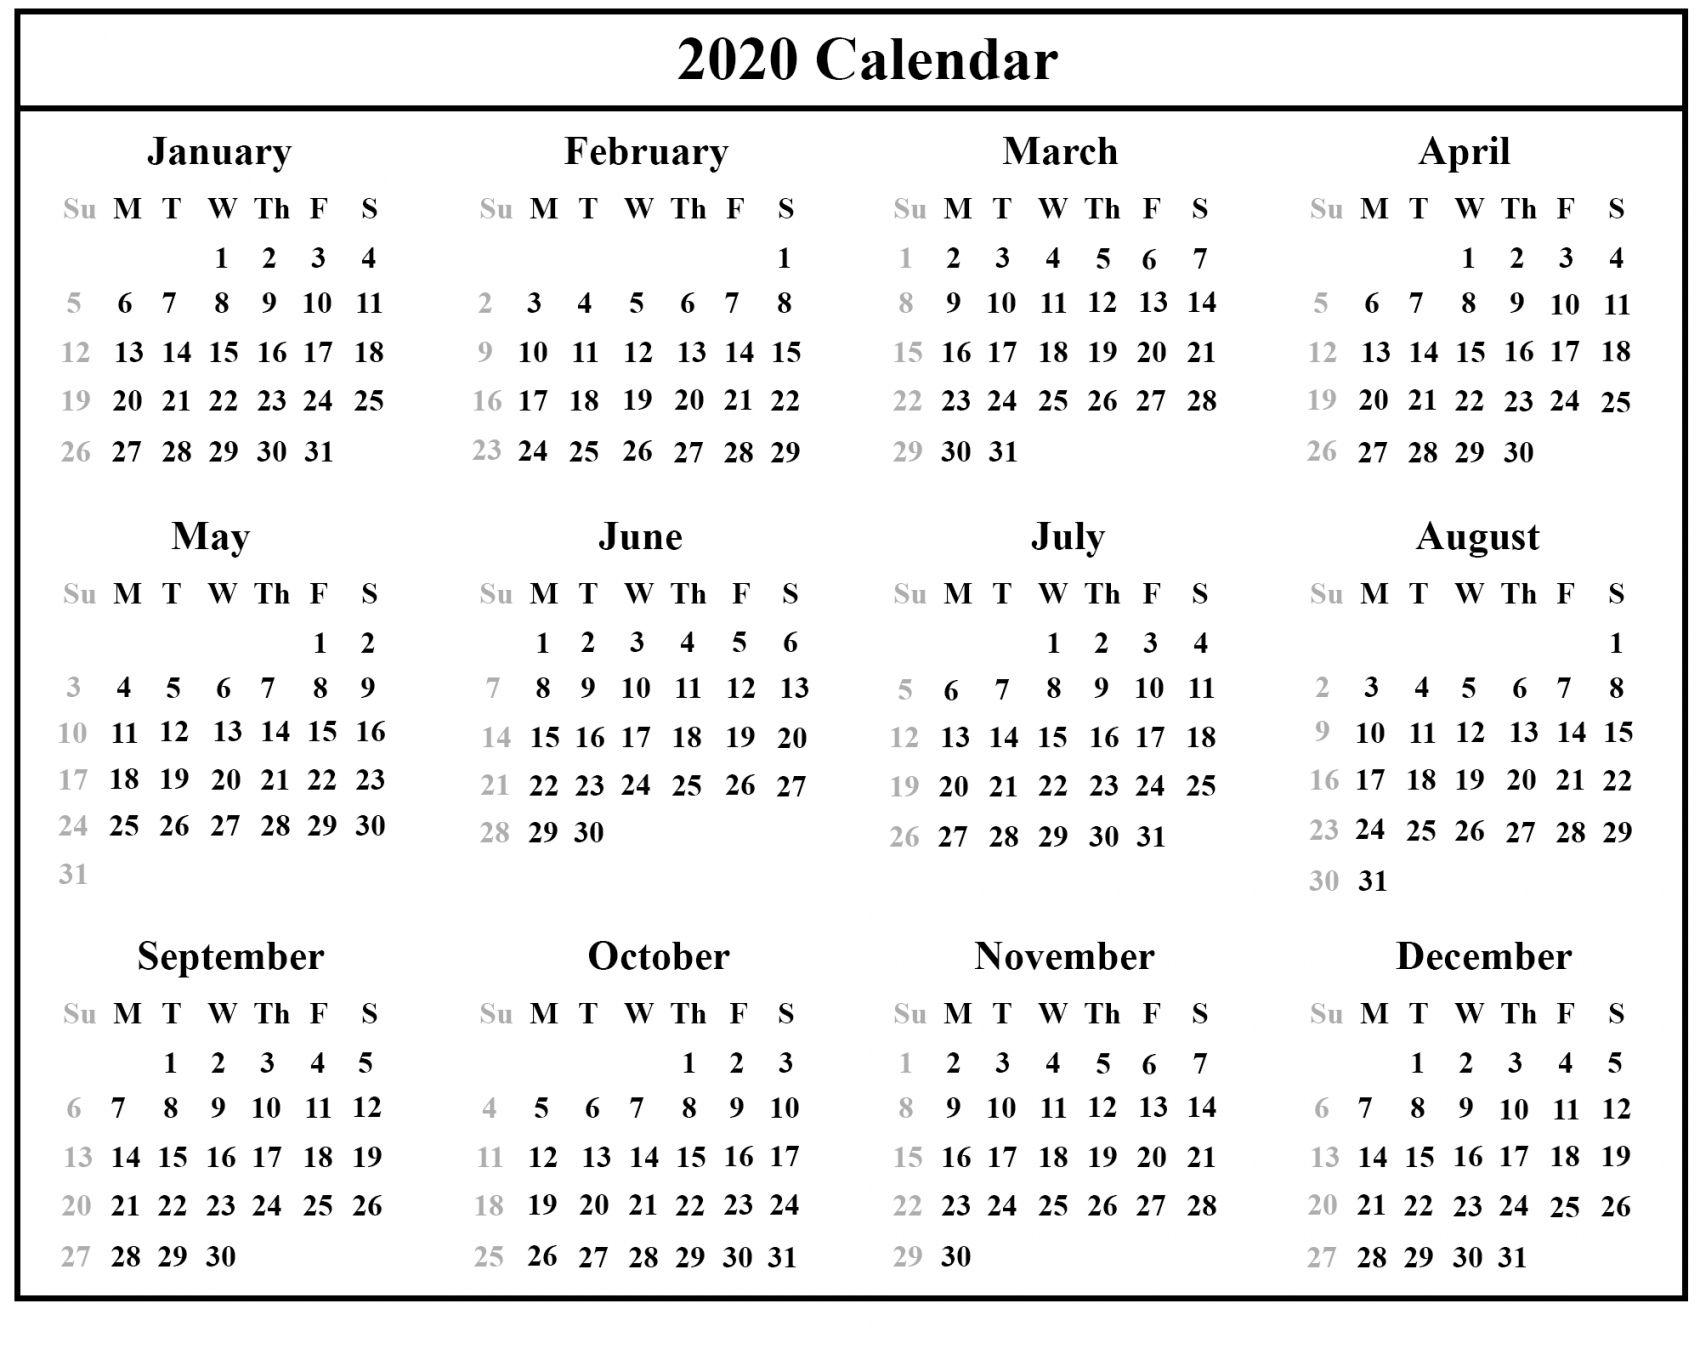 2020 Australian Calendar Printable In 2020 Calendar Printables